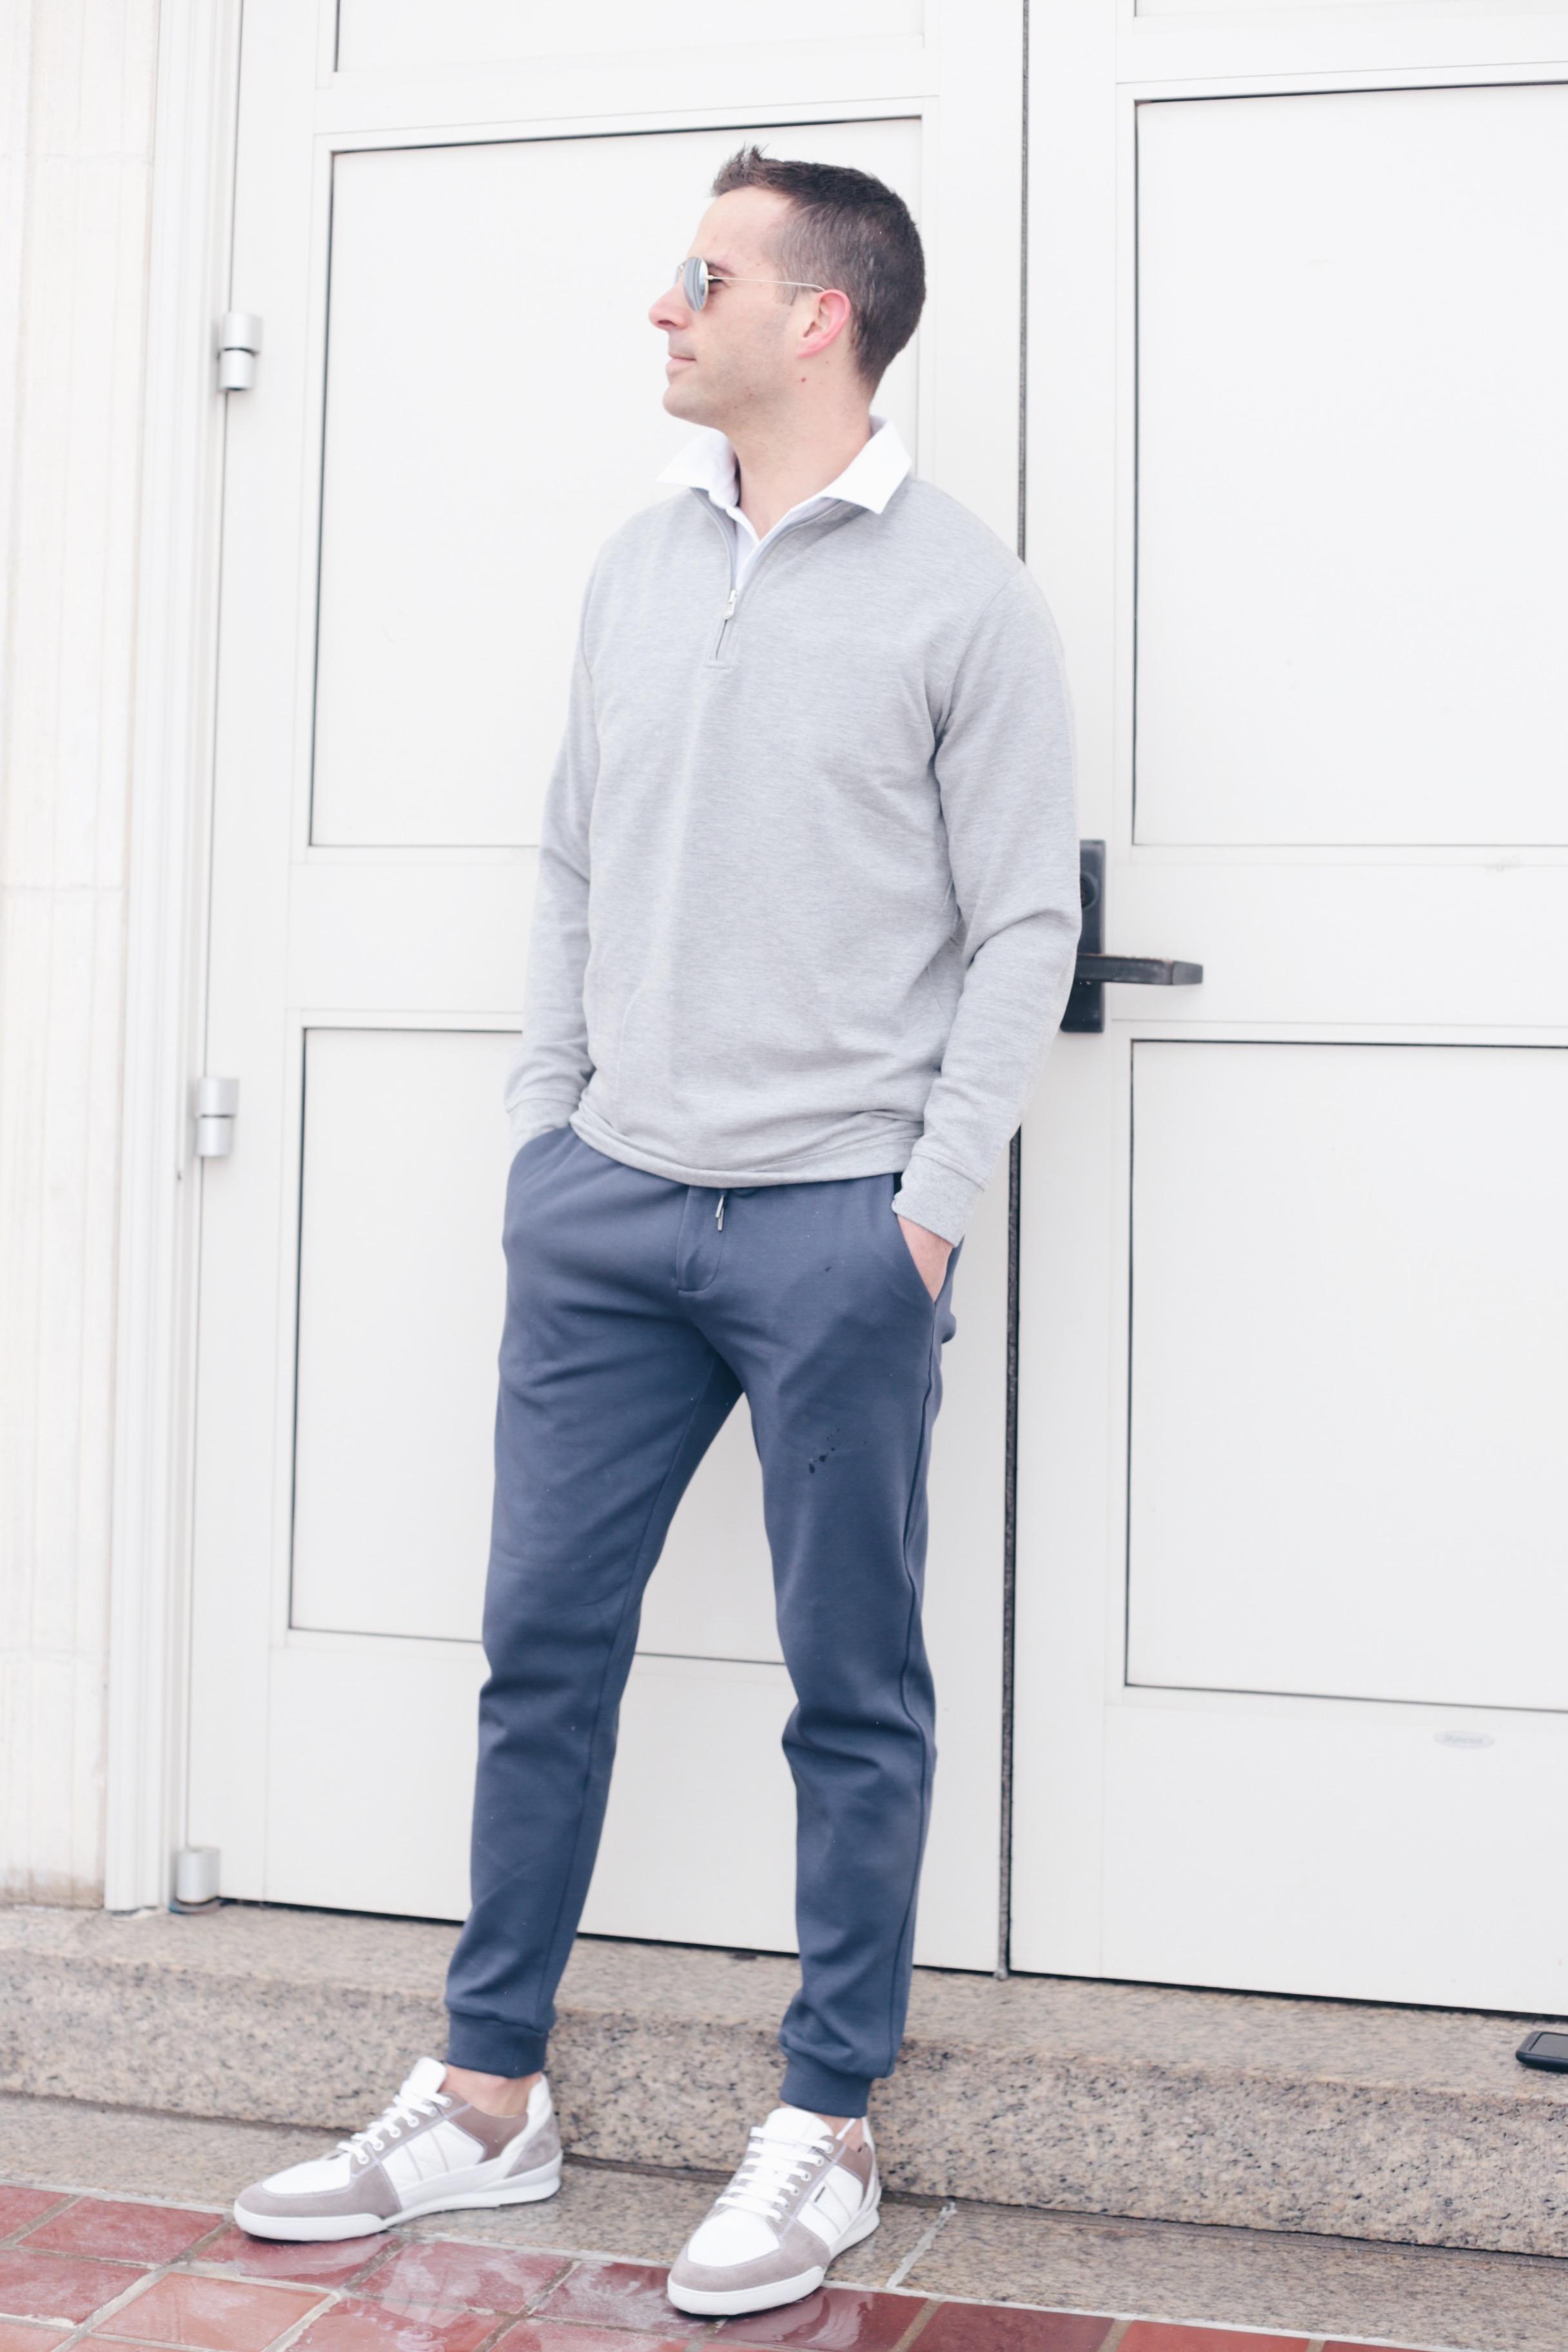 men's spring capsule wardrobe 2019 - men's joggers outfit ideas